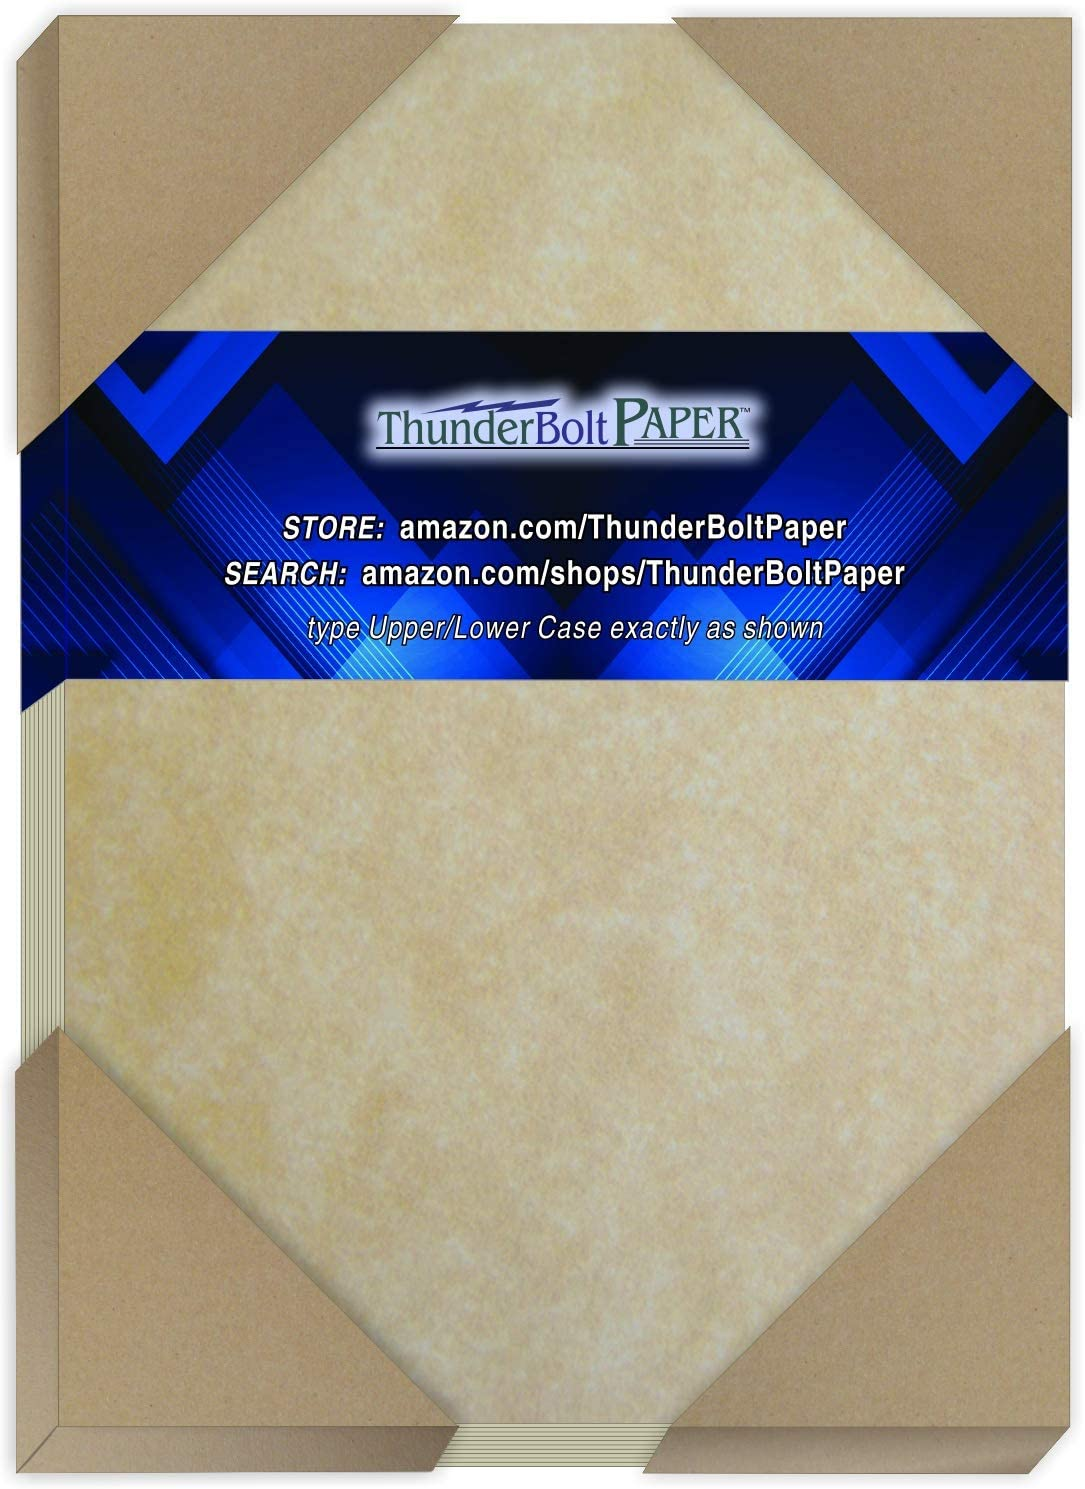 250 Old Age Parchment 65lb Cover Paper Sheets 4.25